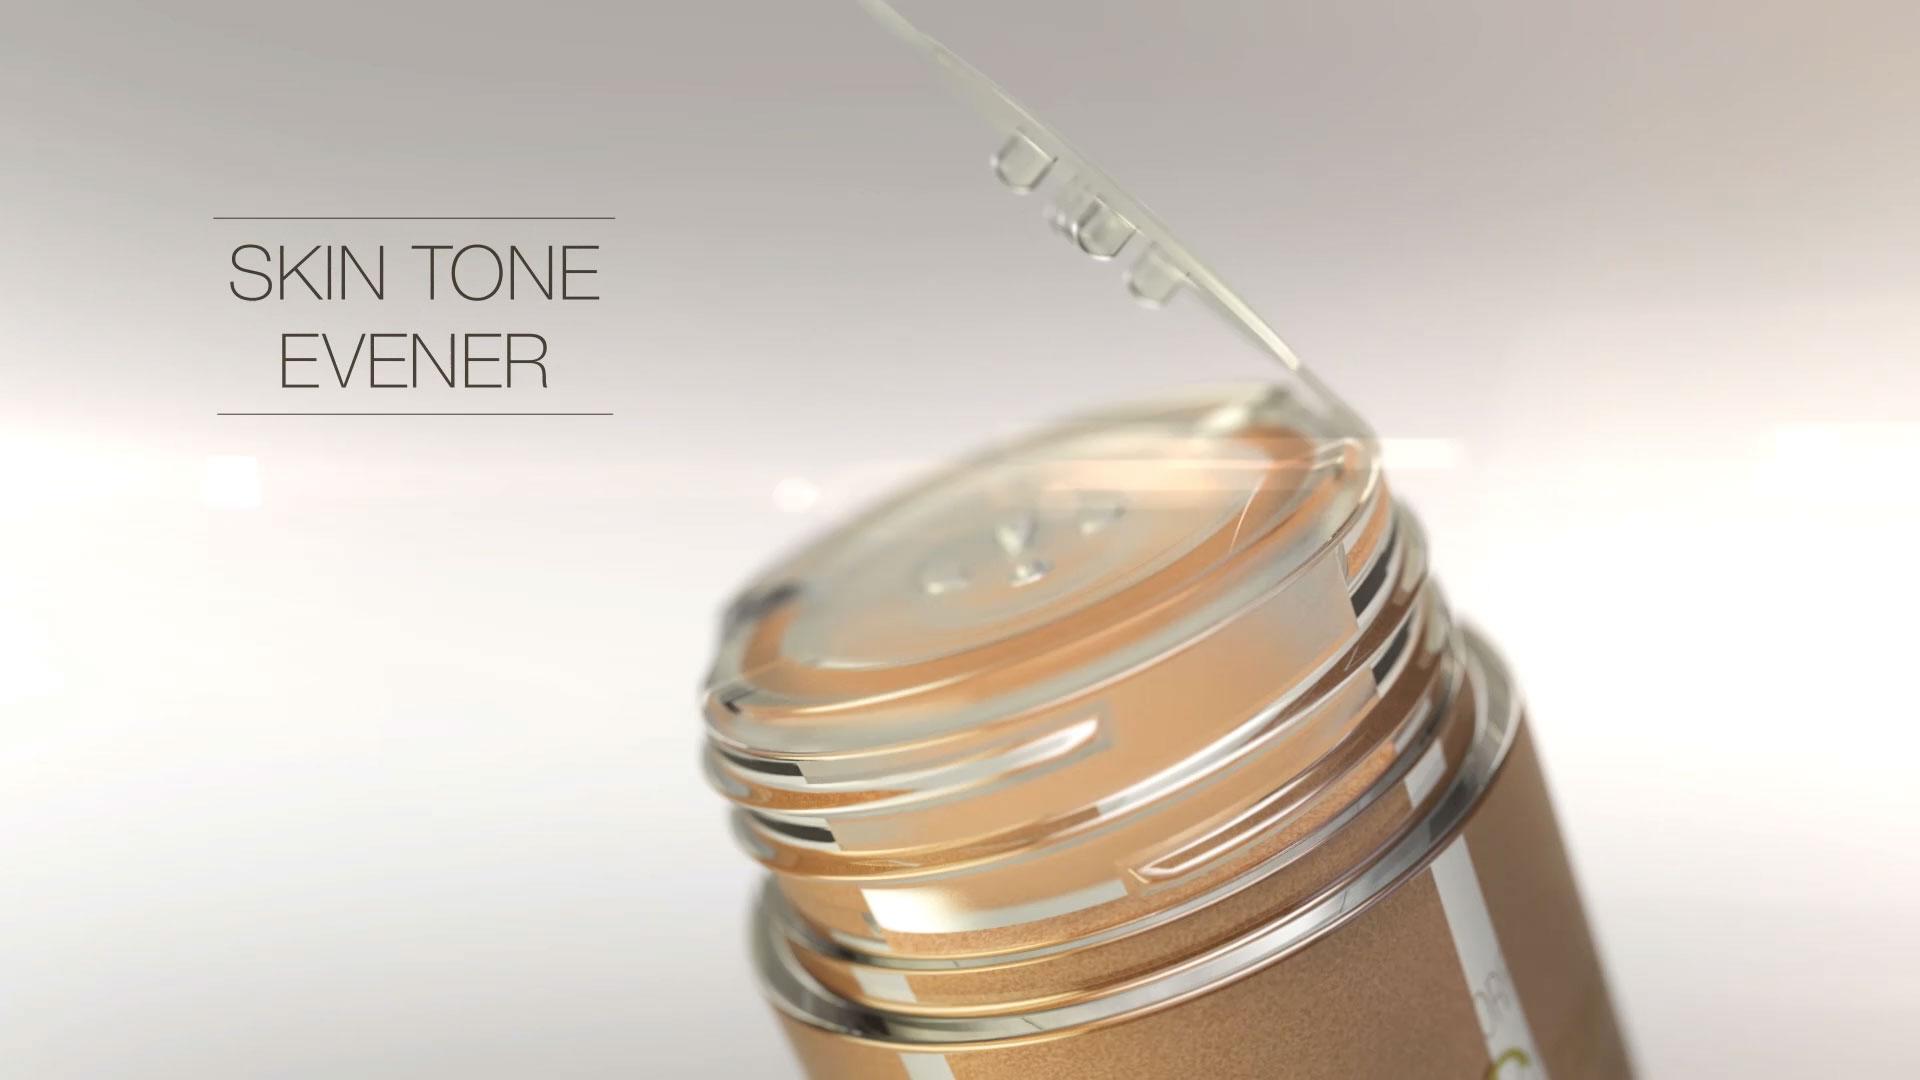 Skin Tone Evener